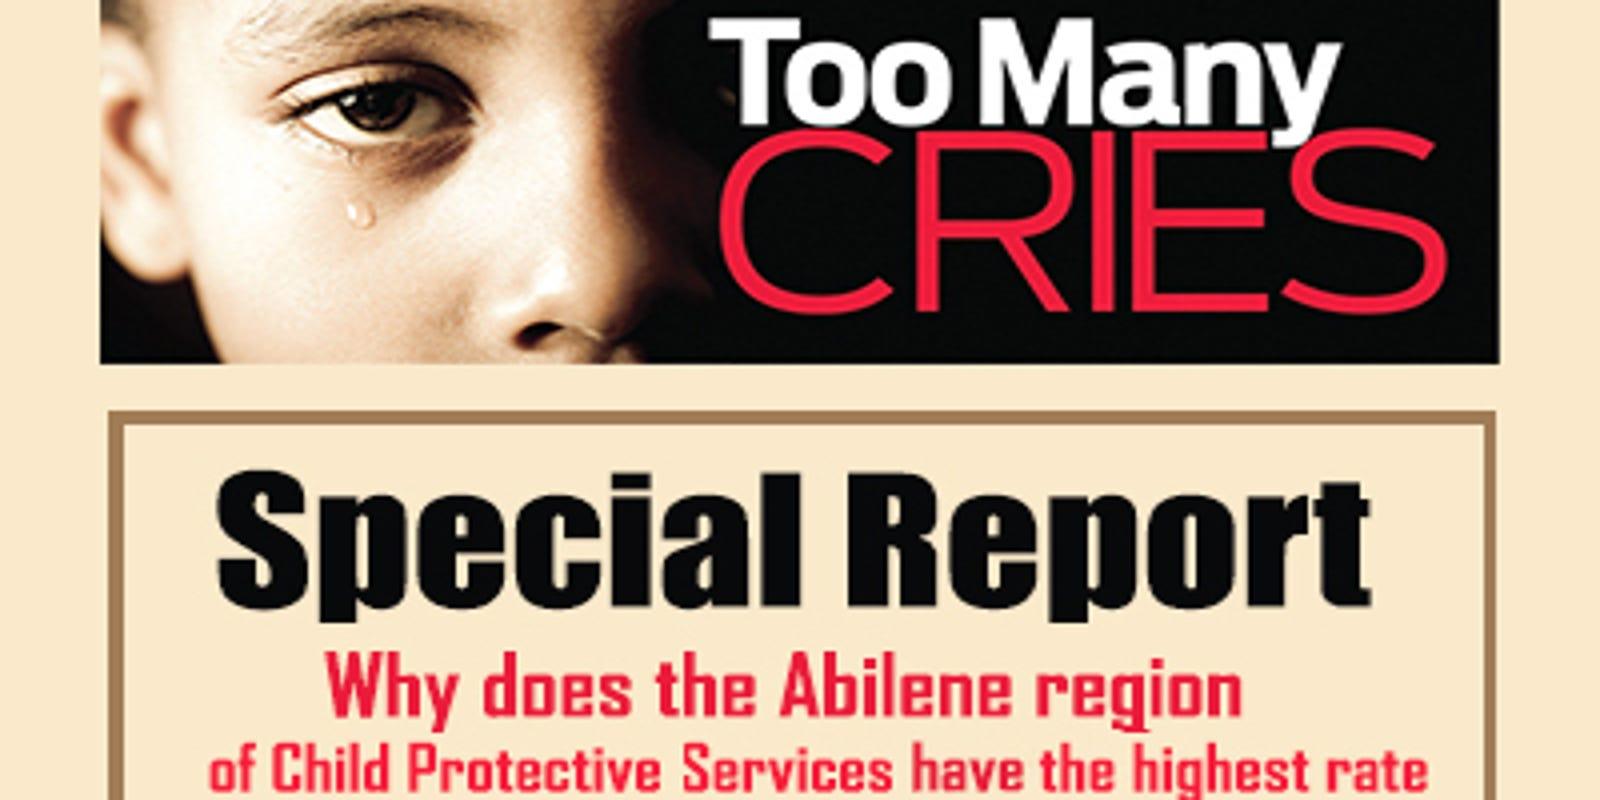 Abilene ranks highest in child abuse/neglect rate